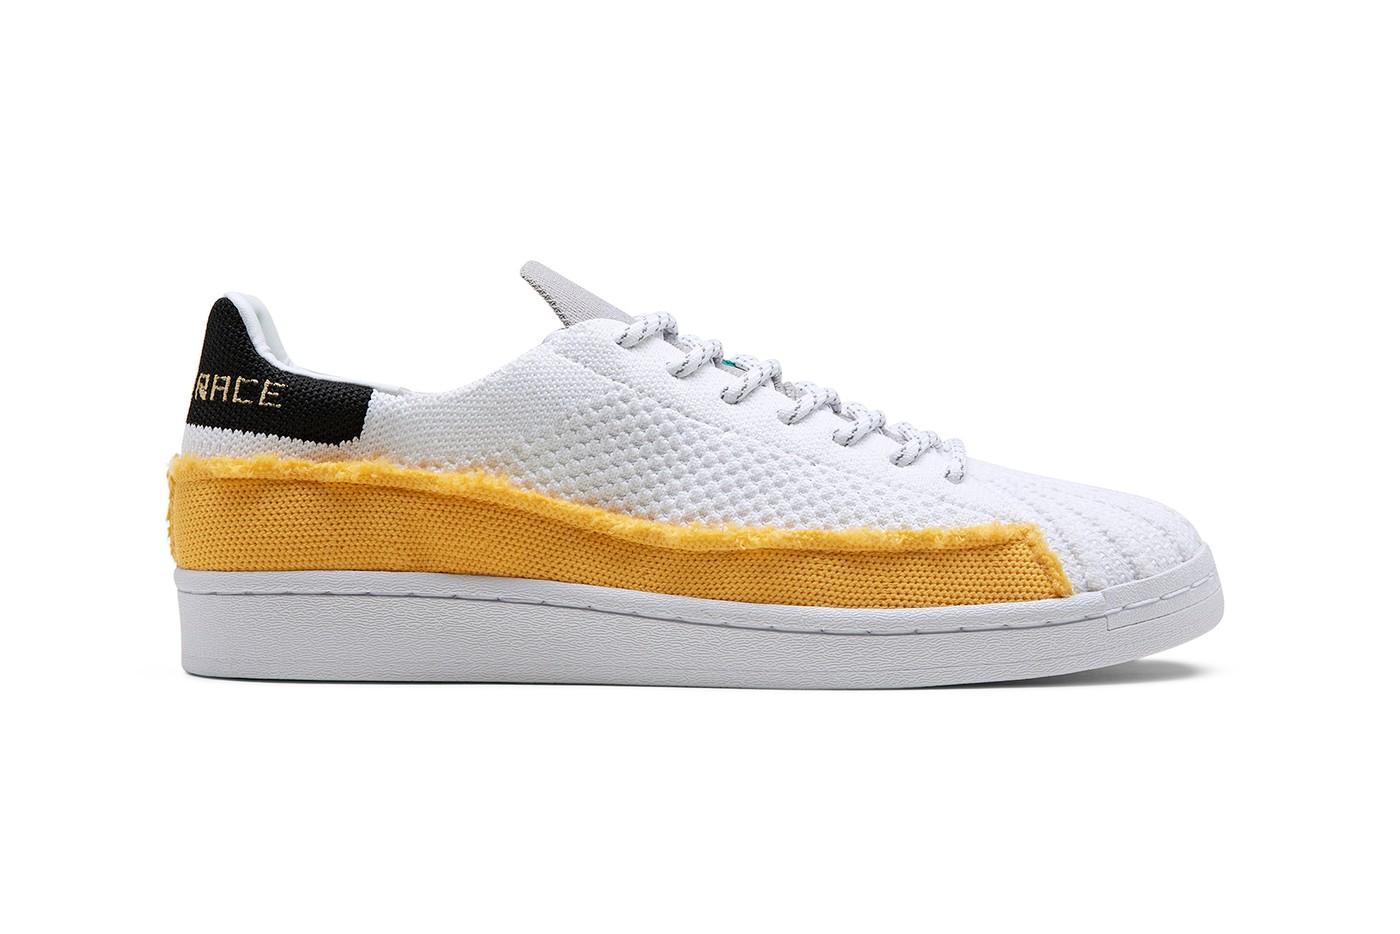 adidas Originals y Pharrell Williams modernizan las clásicas Superstar (5)